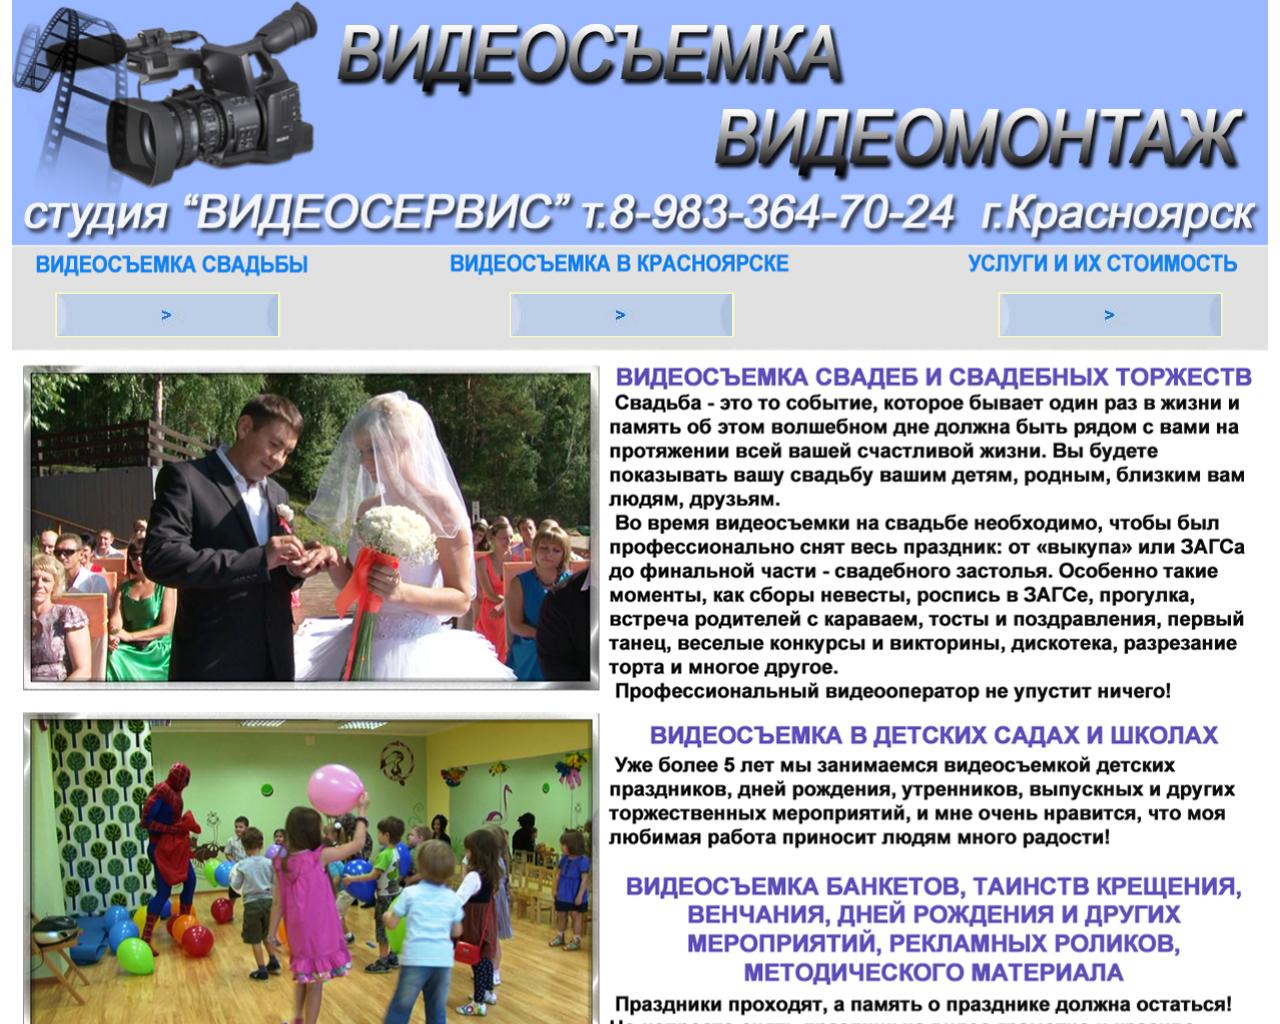 http://www.studia-videoservis.ru